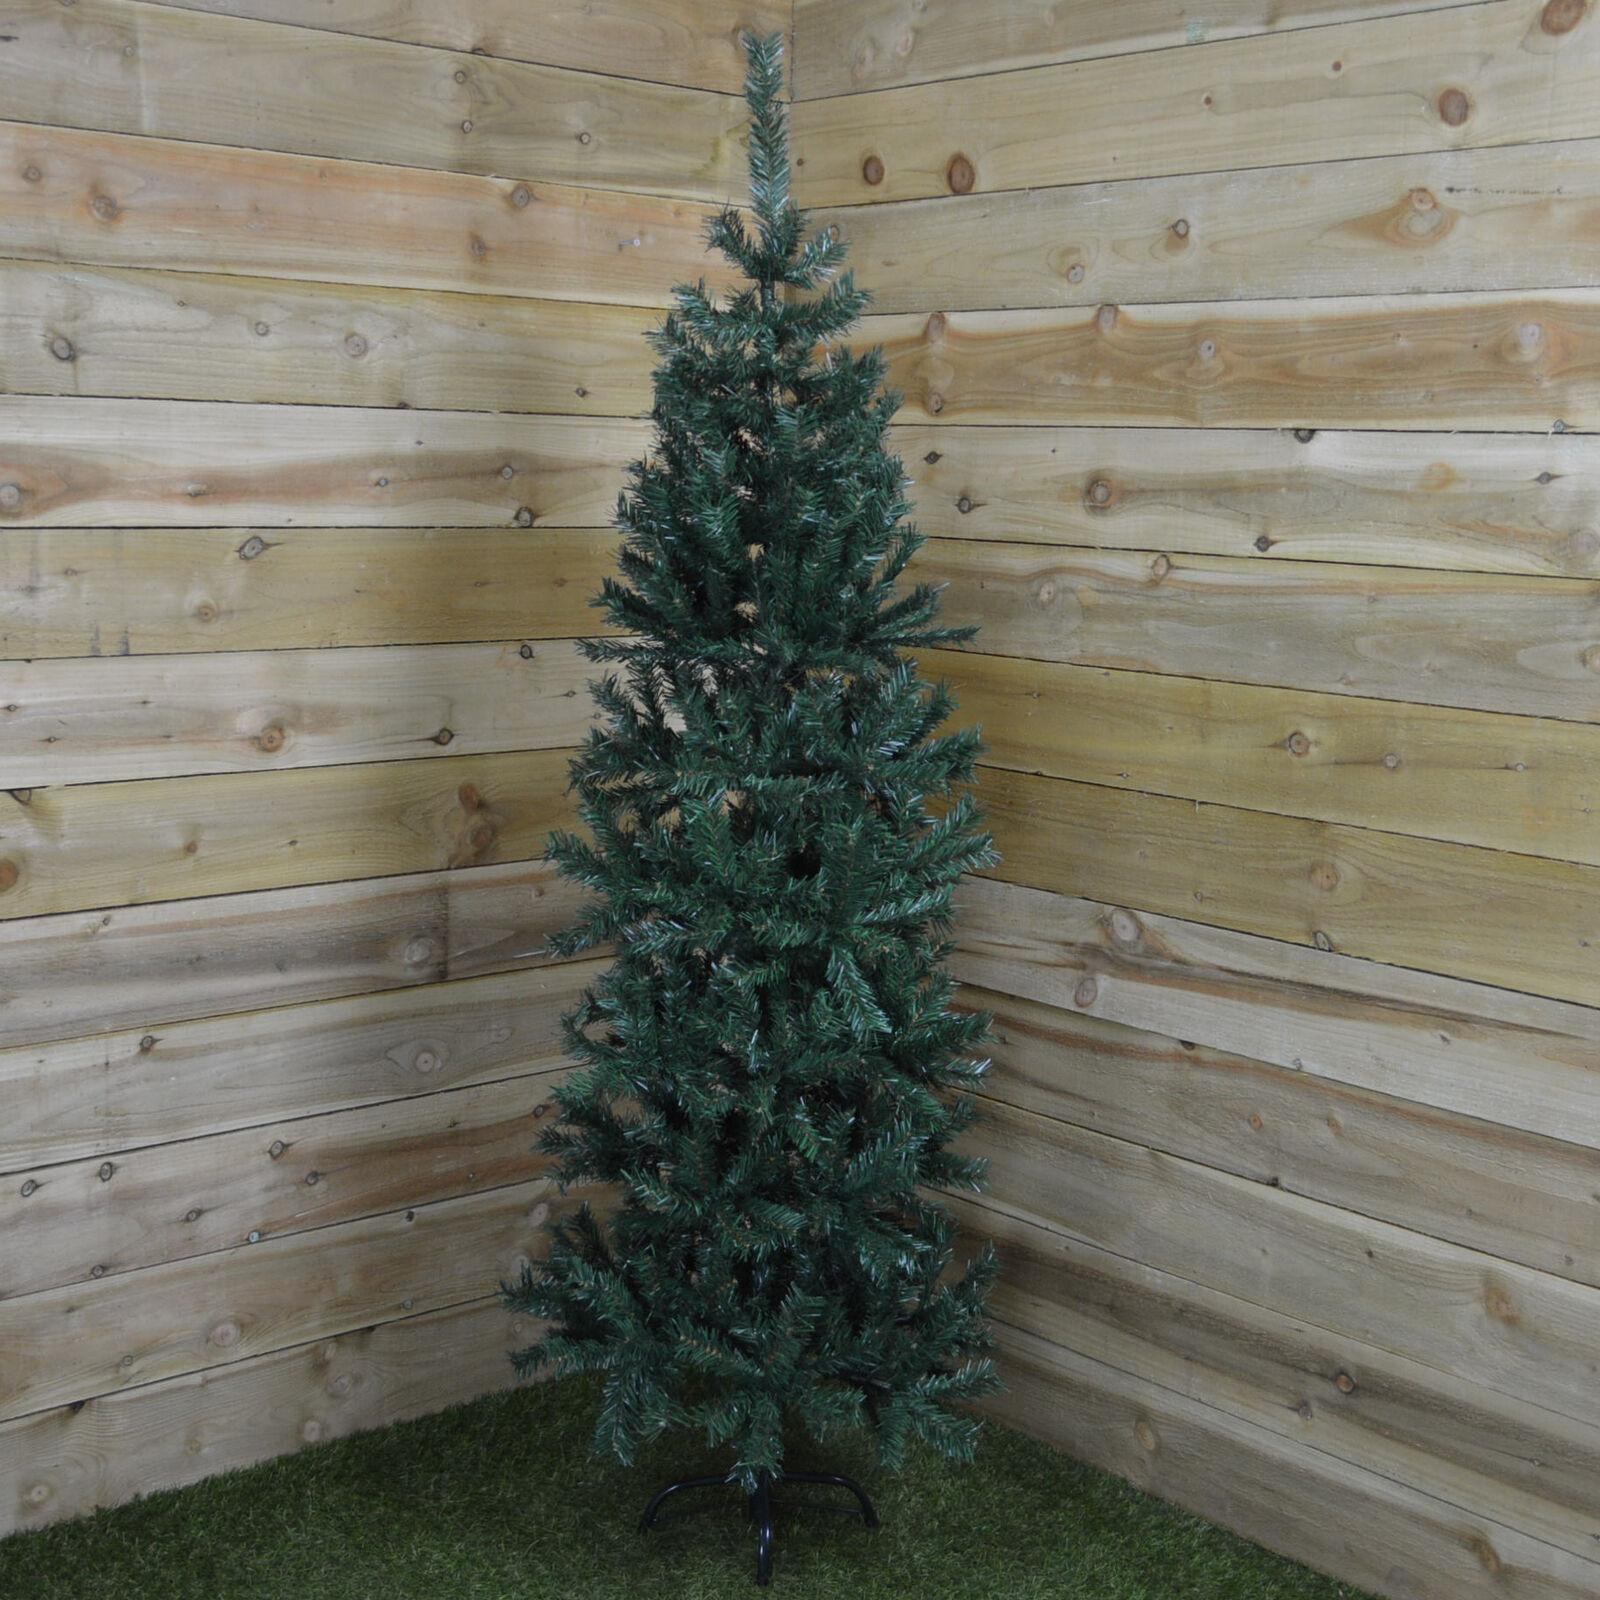 240cm (8ft) Premier Slim Christmas Pine Tree in Green 91cm Wide